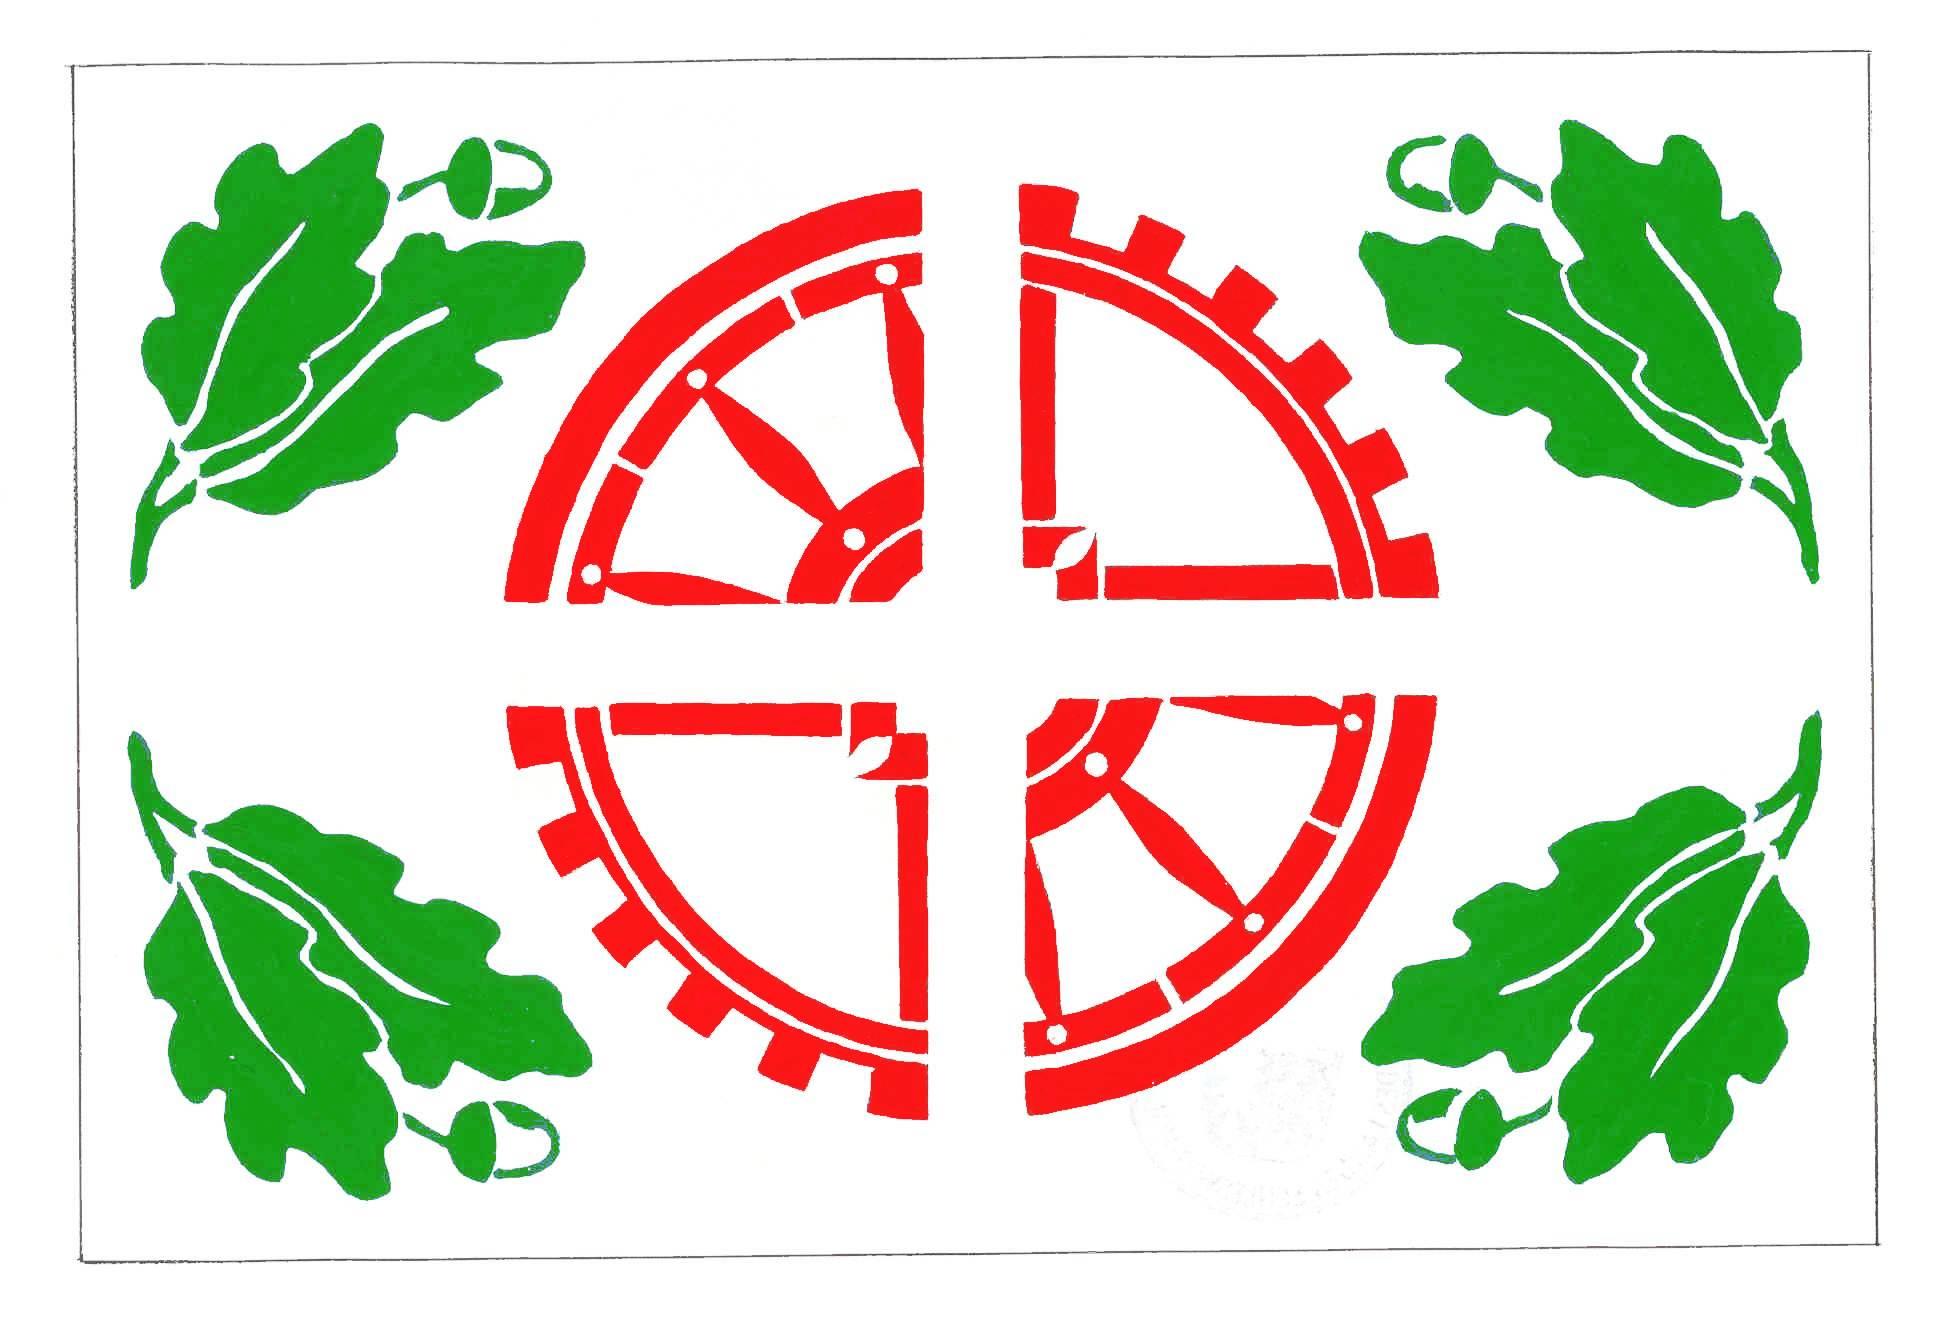 Flagge GemeindeOsdorf, Kreis Rendsburg-Eckernförde